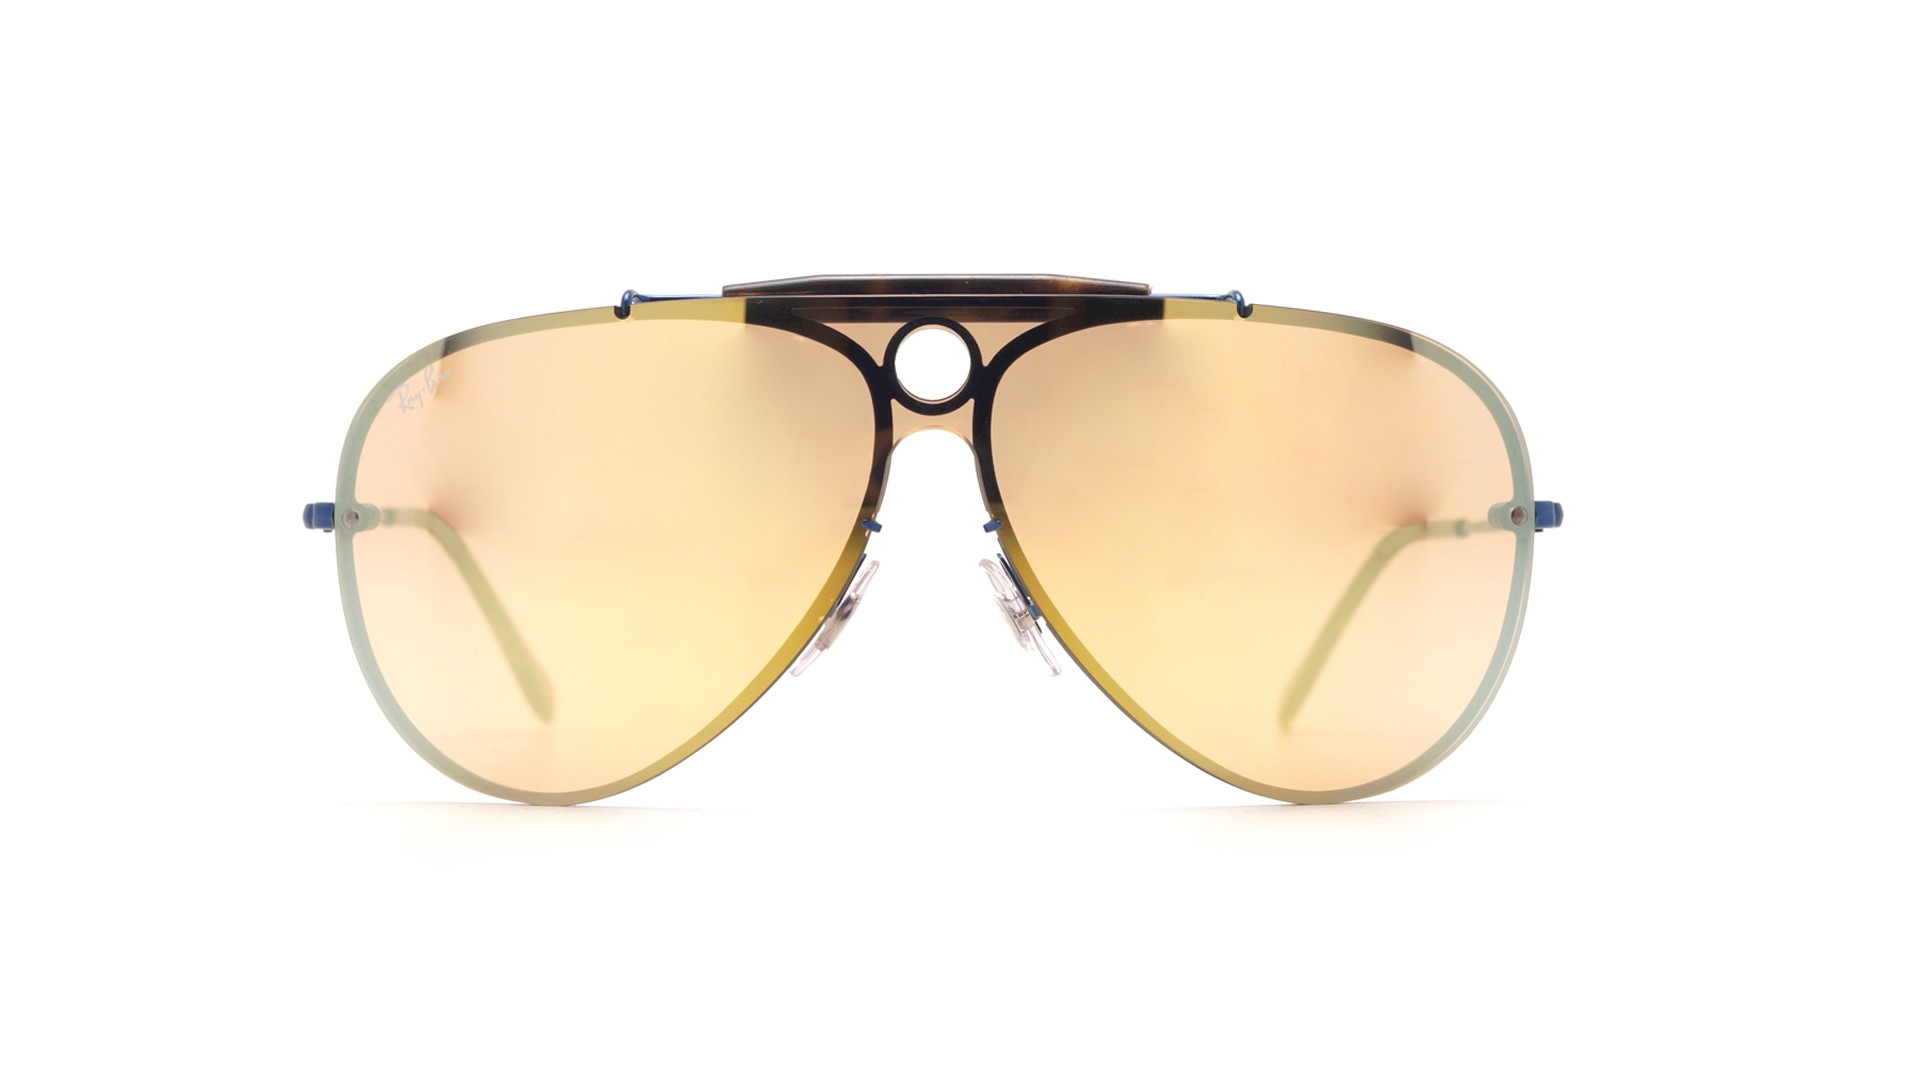 b409a34ffc9 Sunglasses Ray-Ban Shooter Blaze Blue RB3581N 90387J Large Mirror